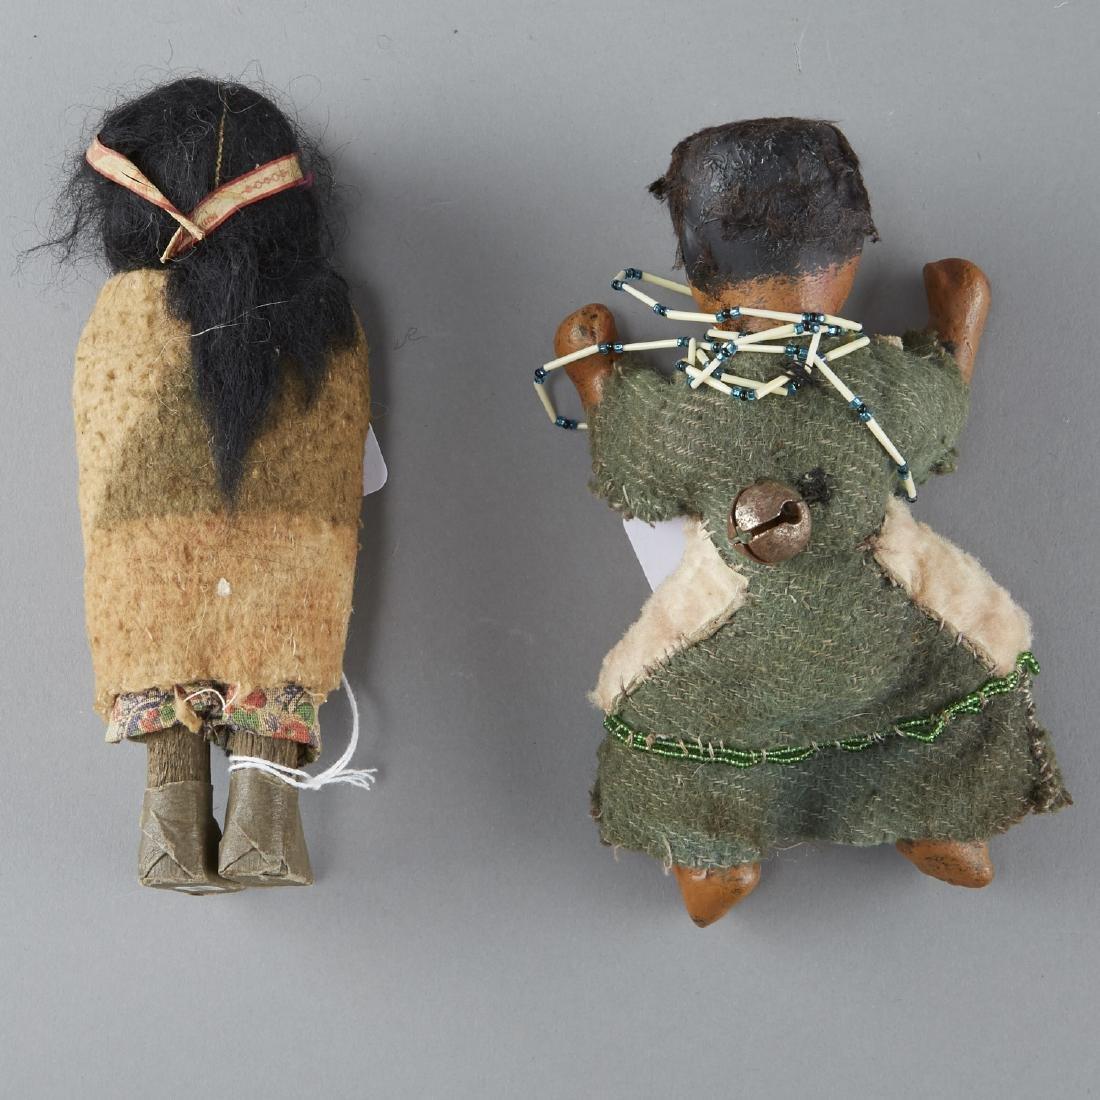 2 Native American Dolls, 1 Skookum - 2